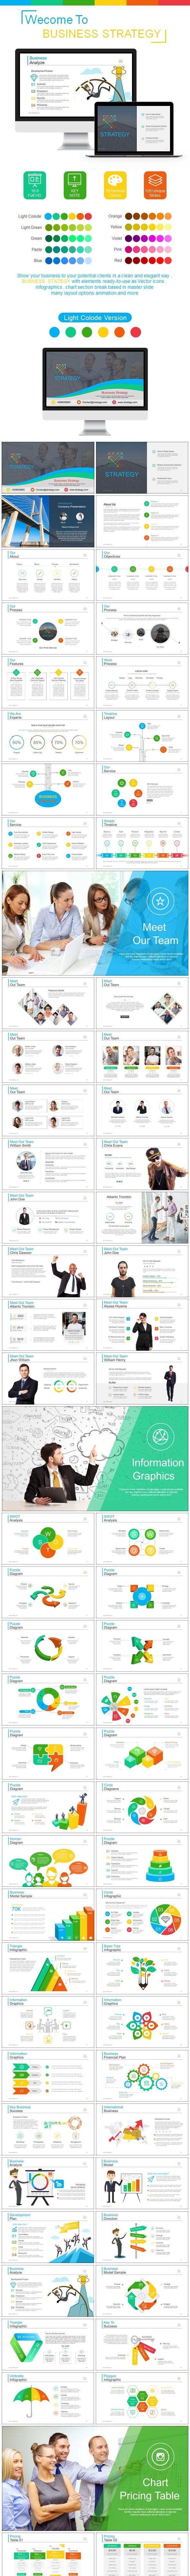 Business Strategy Keynote Templates - Keynote Templates Presentation Templates